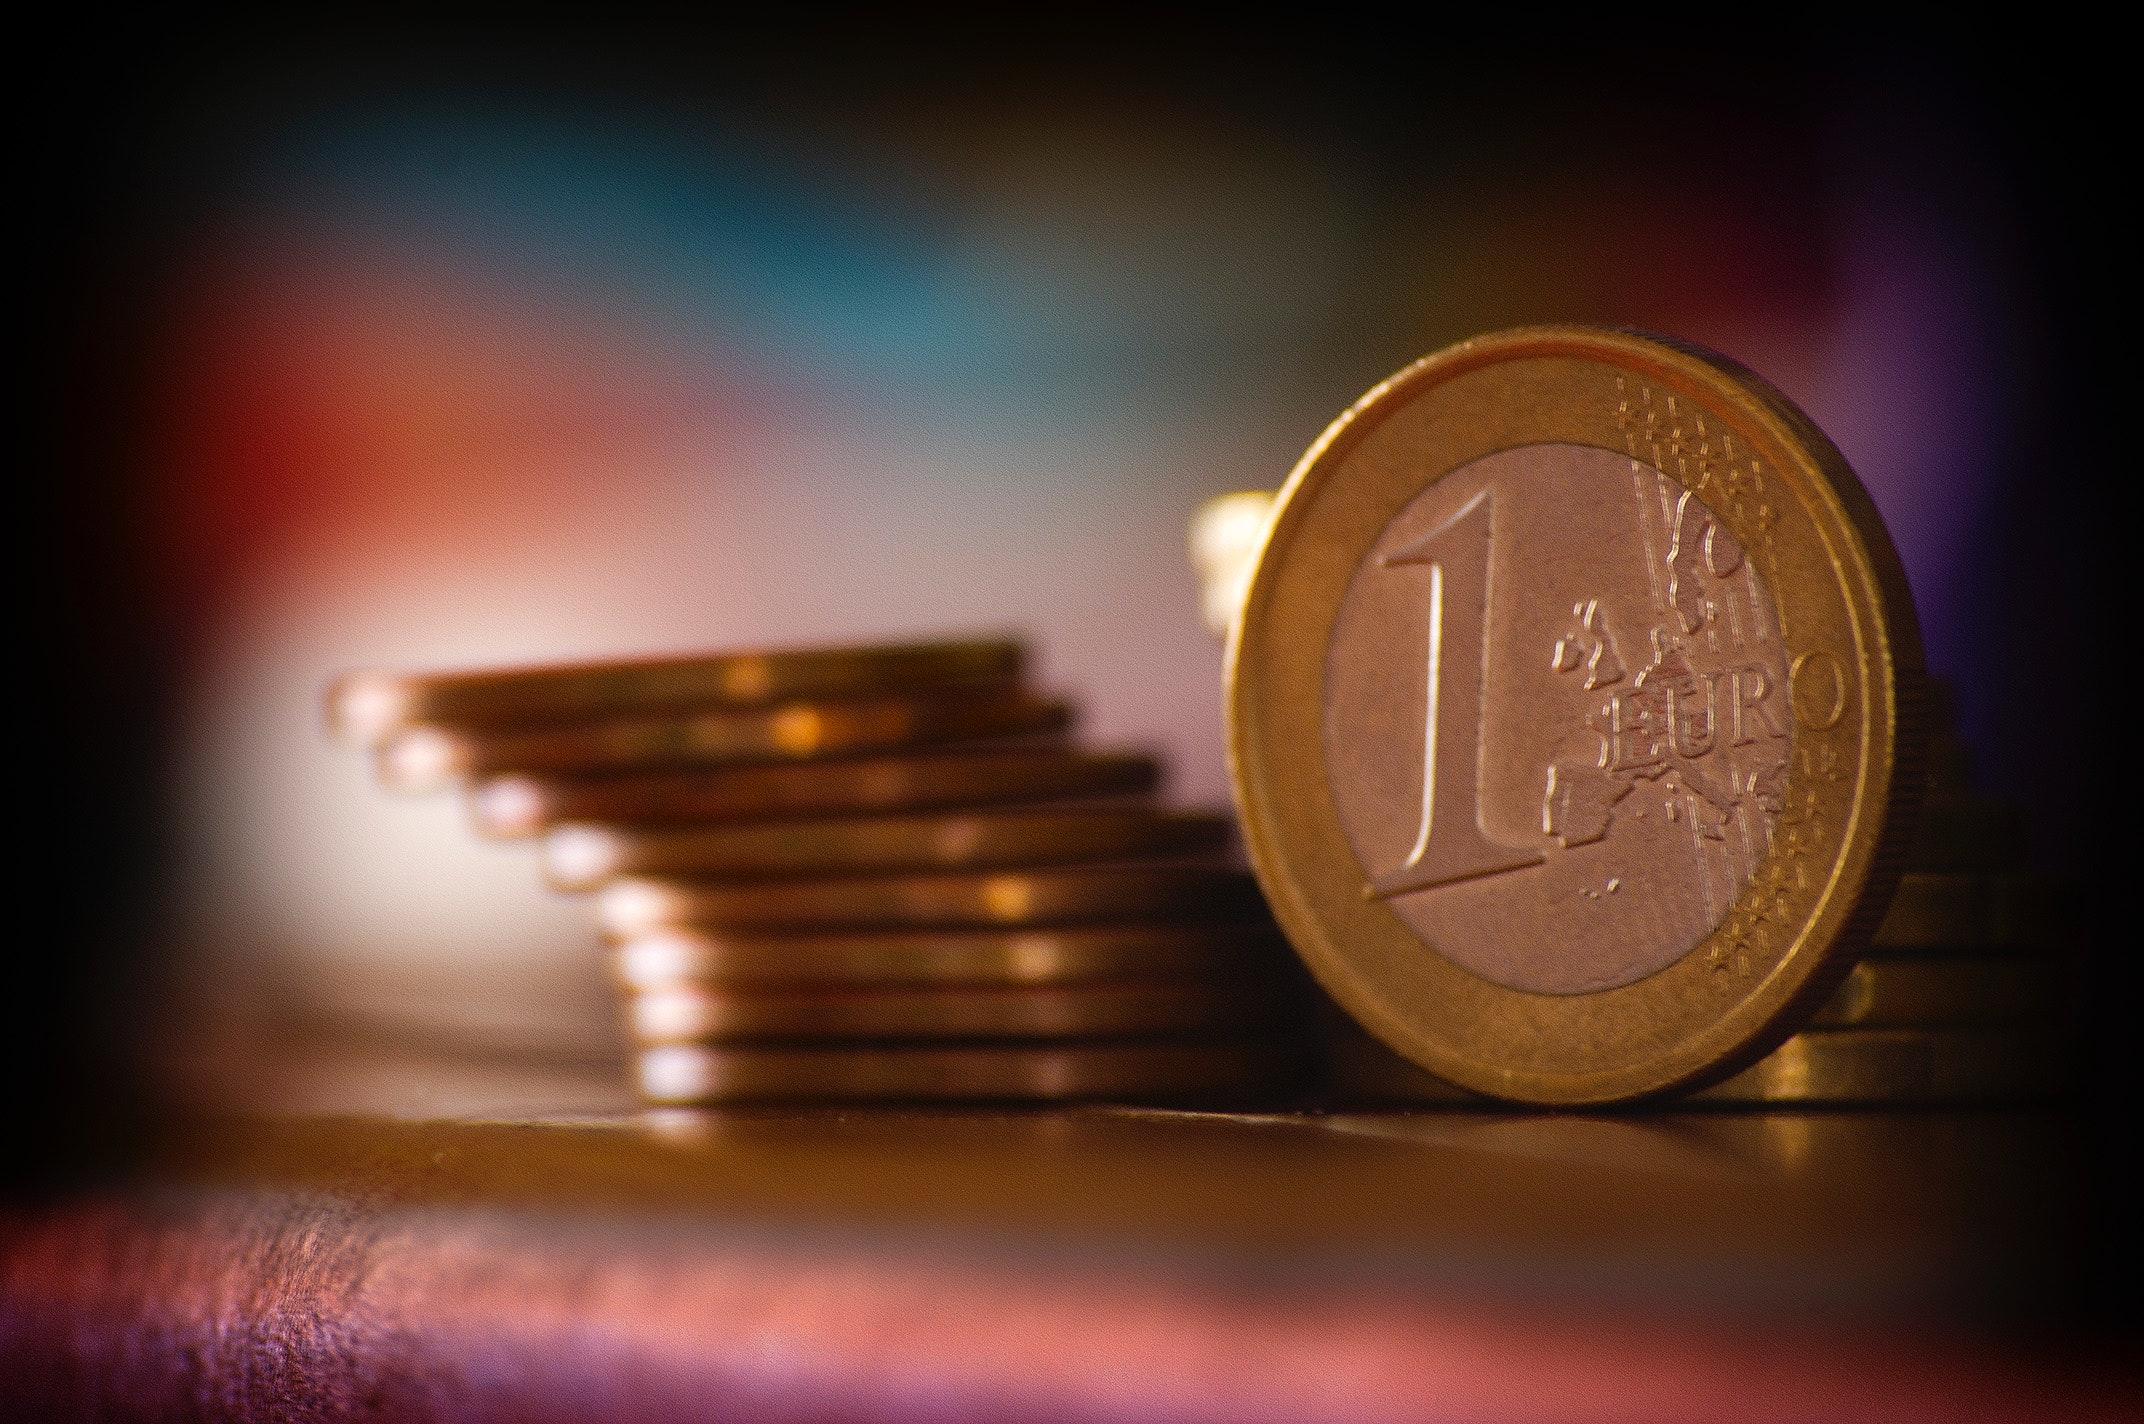 1 Euro Cent, Blur, Still life, Savings, Pay, HQ Photo